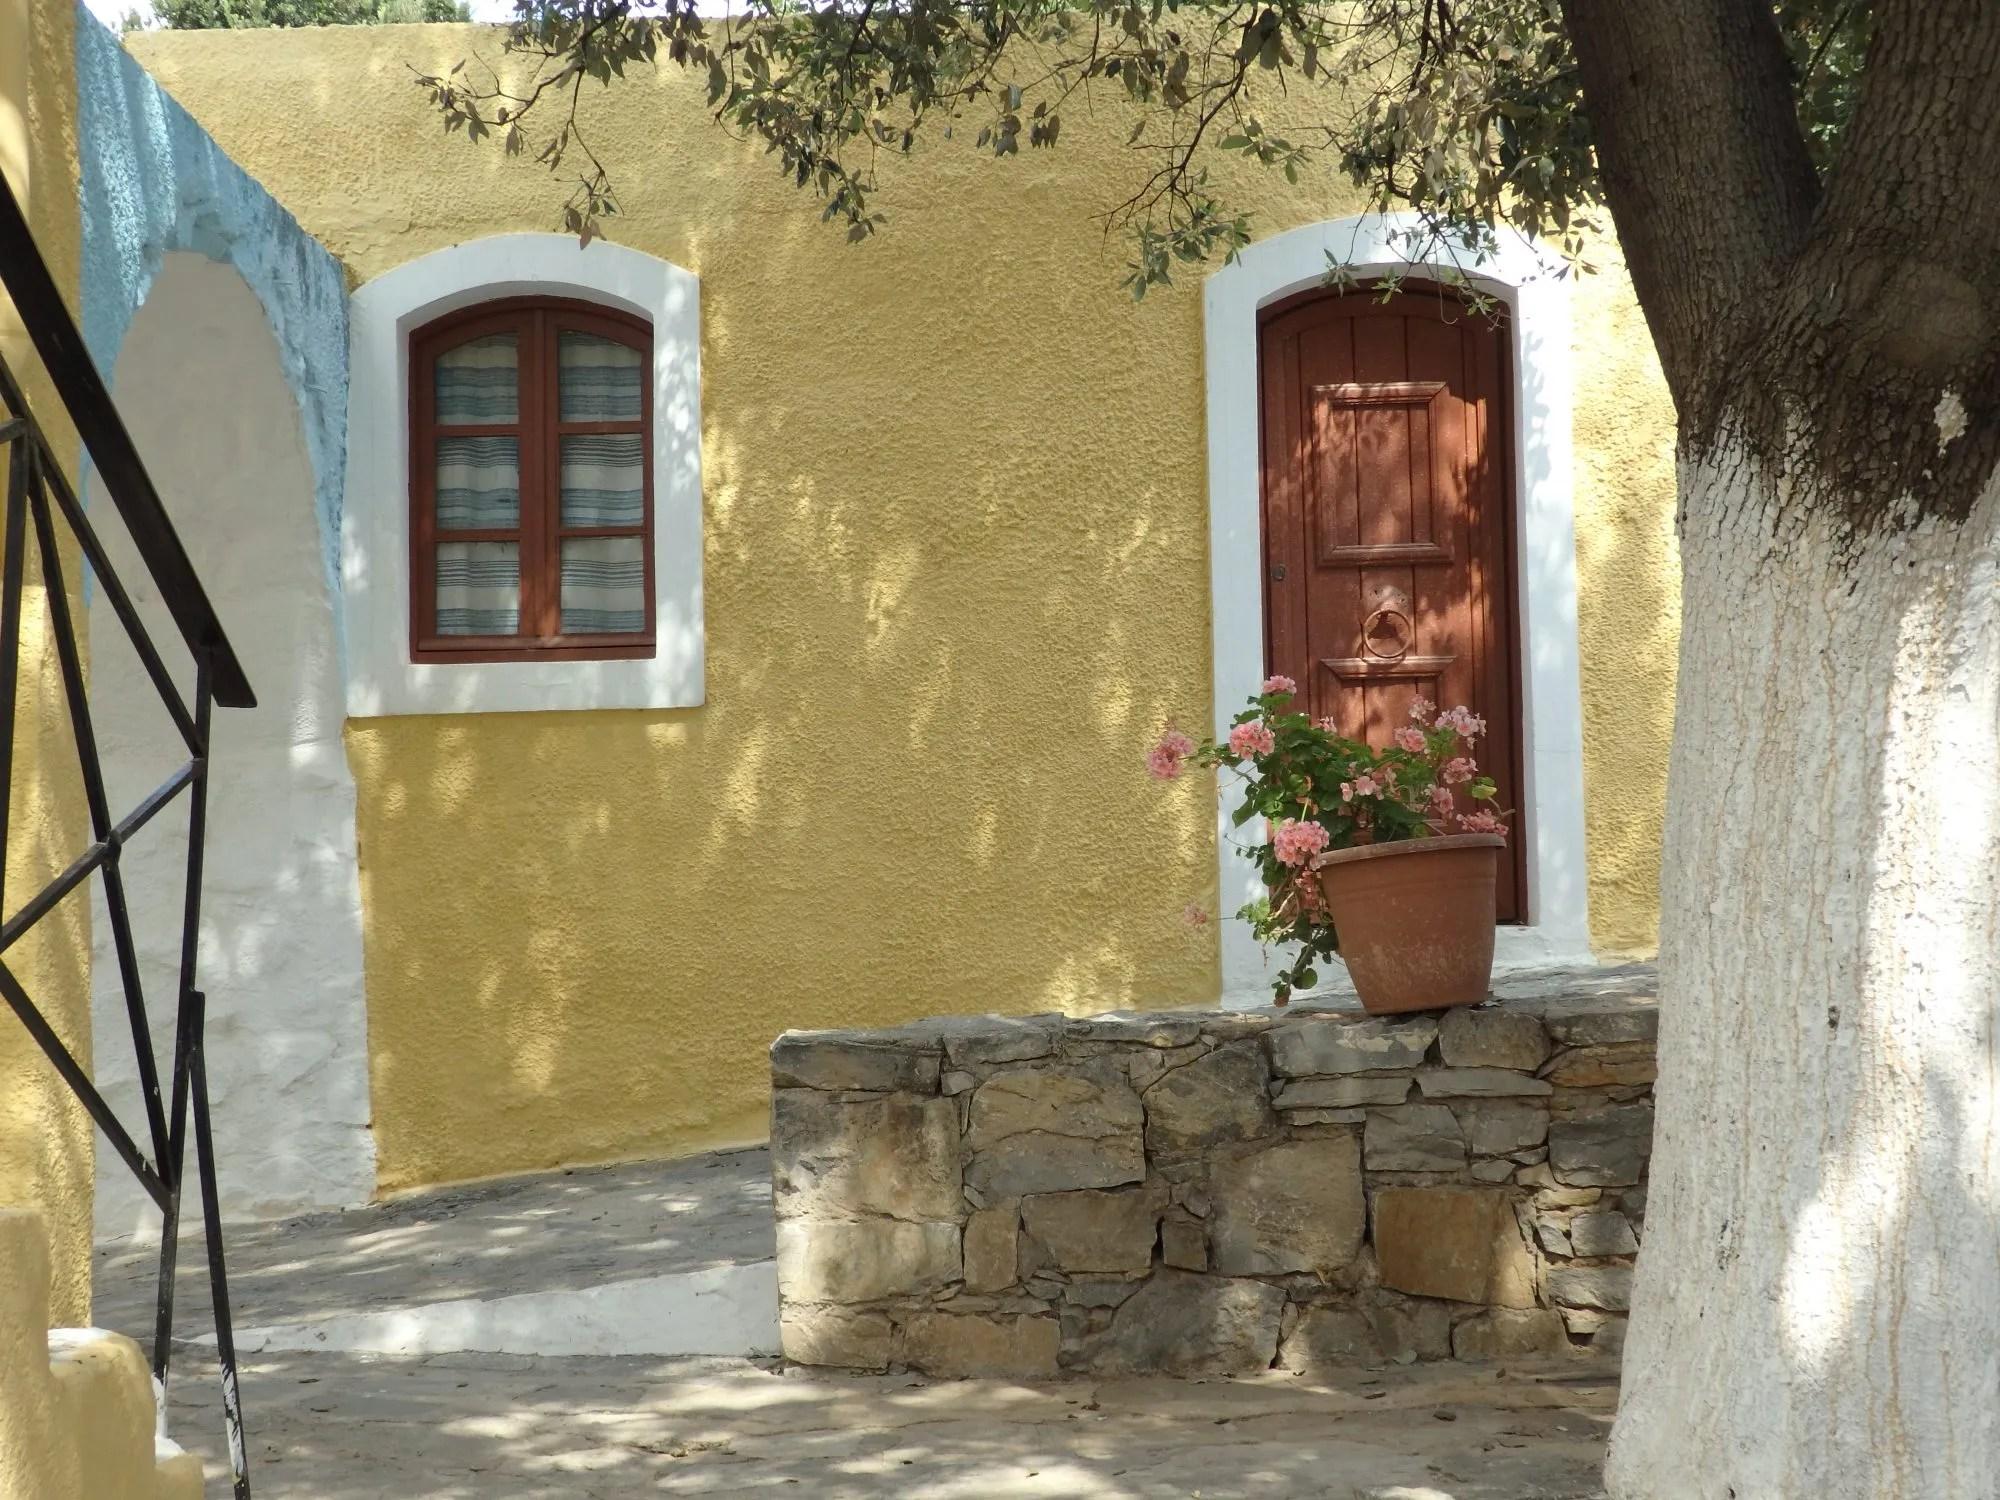 in Arolithos village